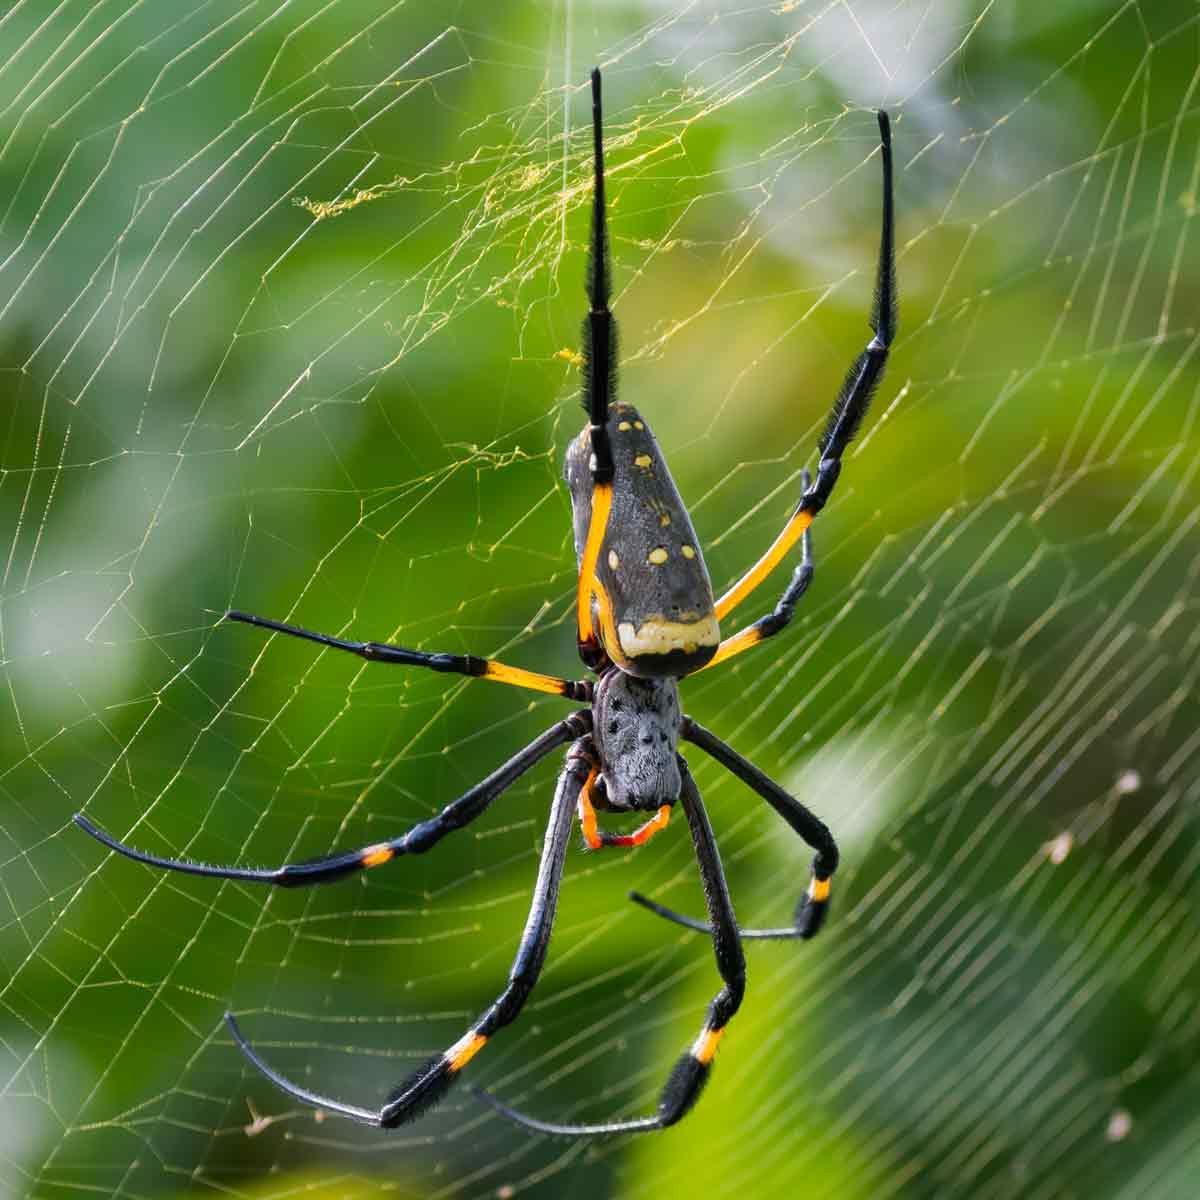 Orb-weaver-spider